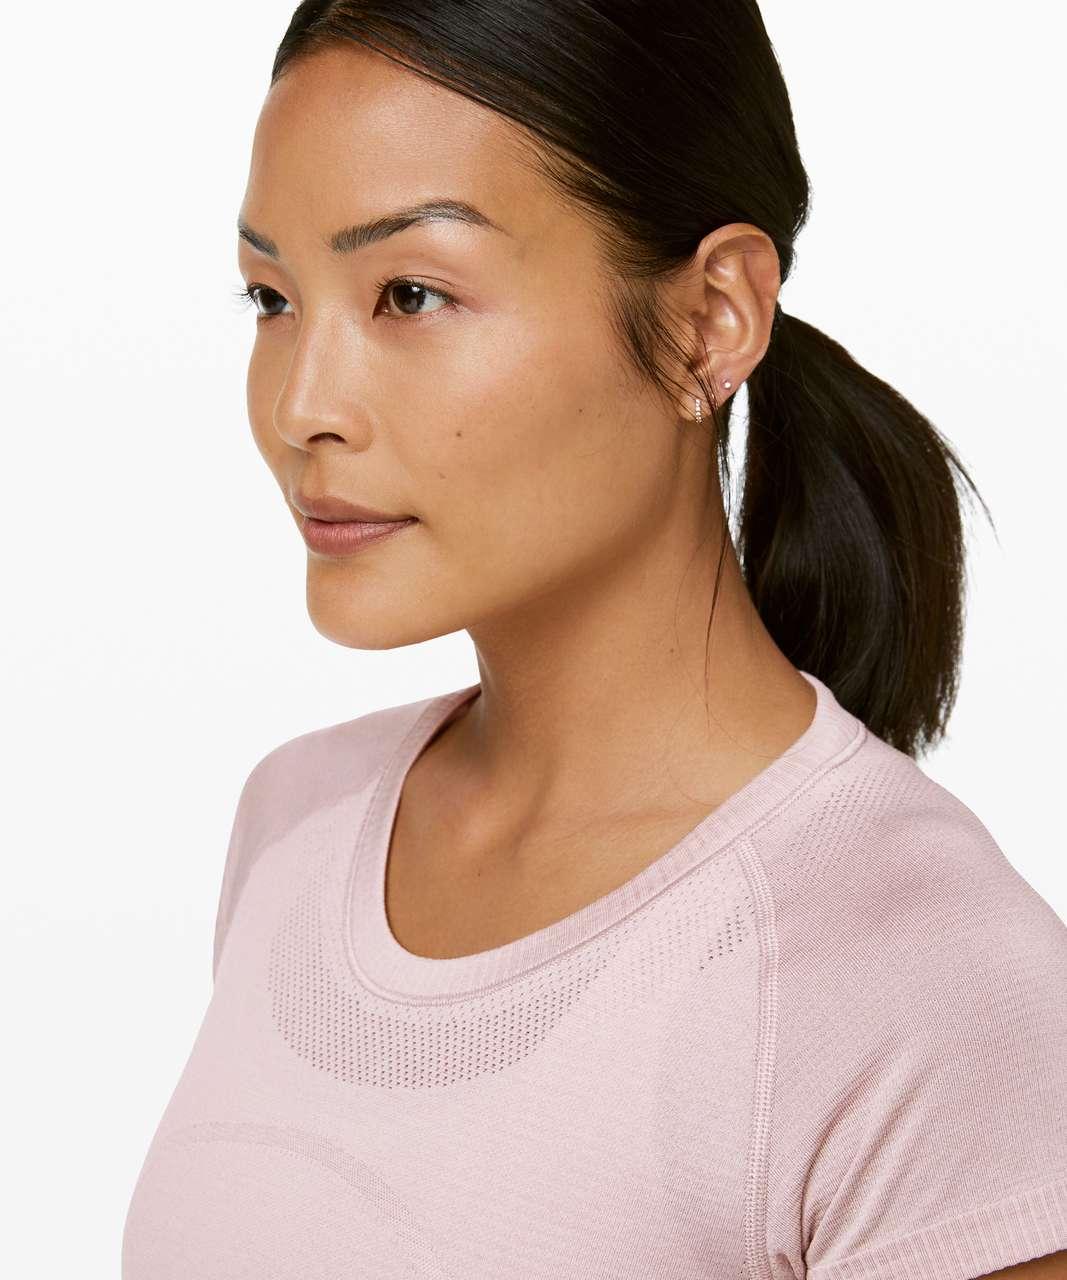 Lululemon Swiftly Tech Short Sleeve Crew - Pink Bliss / Pink Bliss